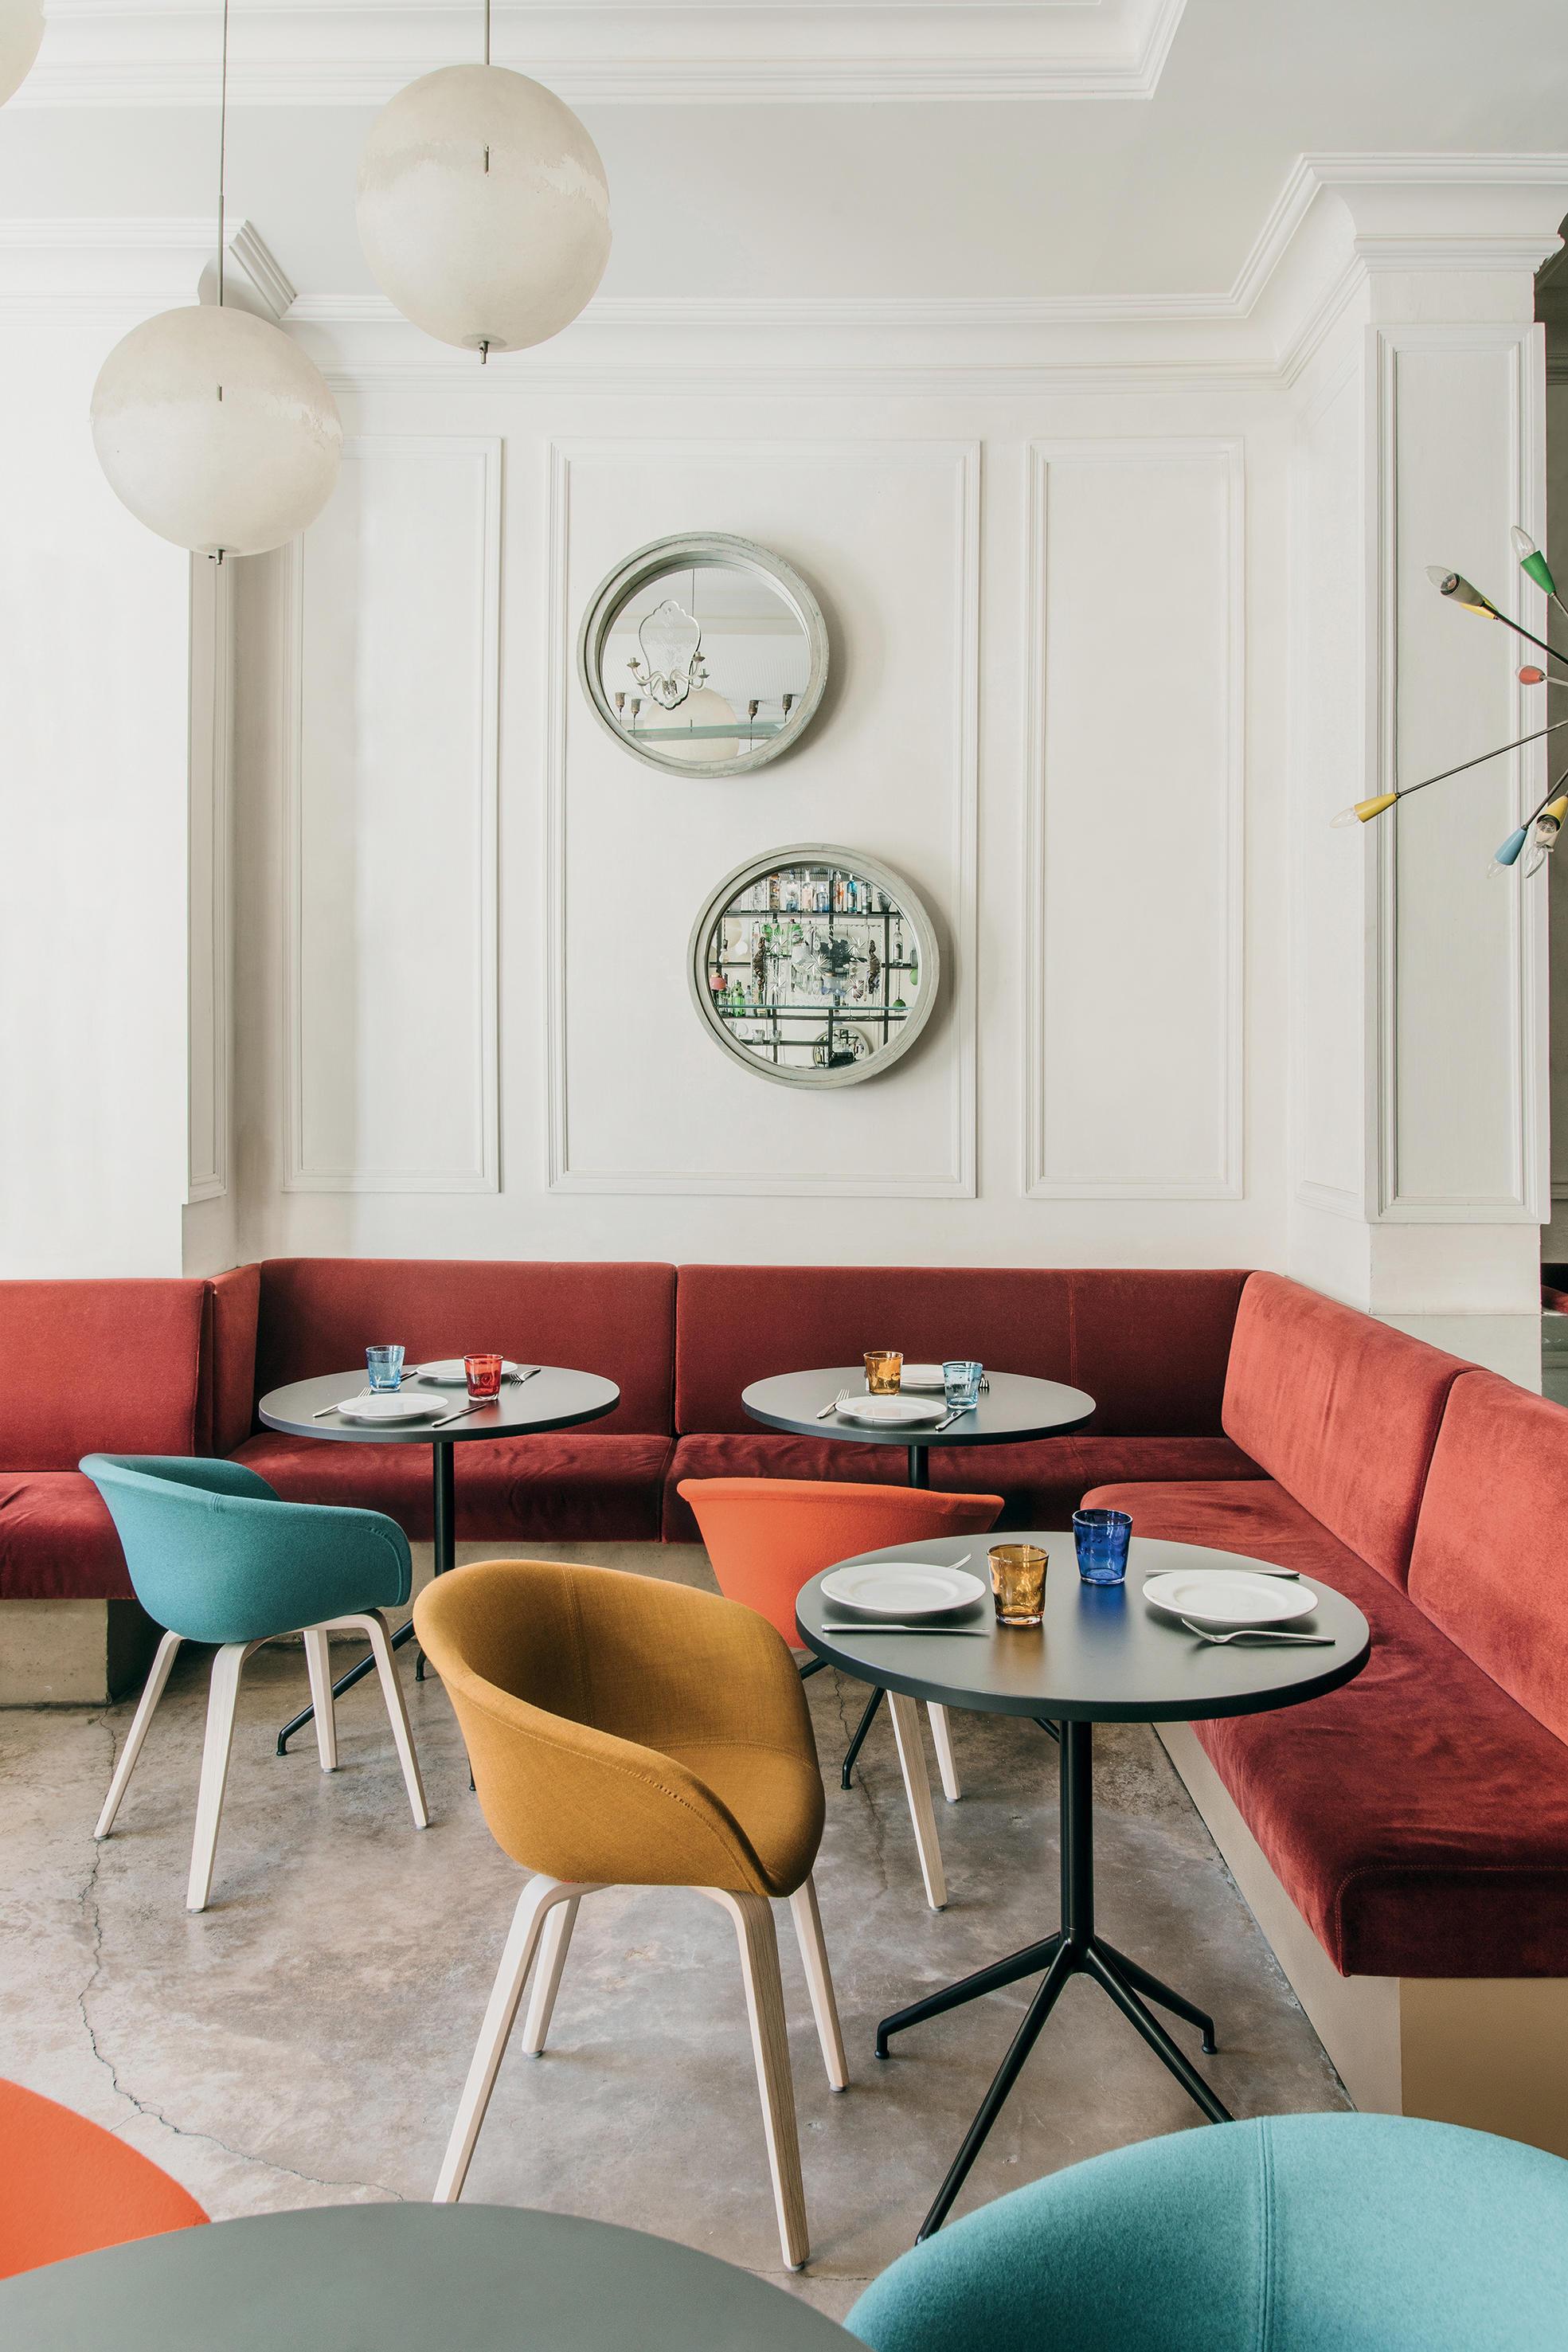 Sensational Duna 02 Chairs From Arper Architonic Machost Co Dining Chair Design Ideas Machostcouk